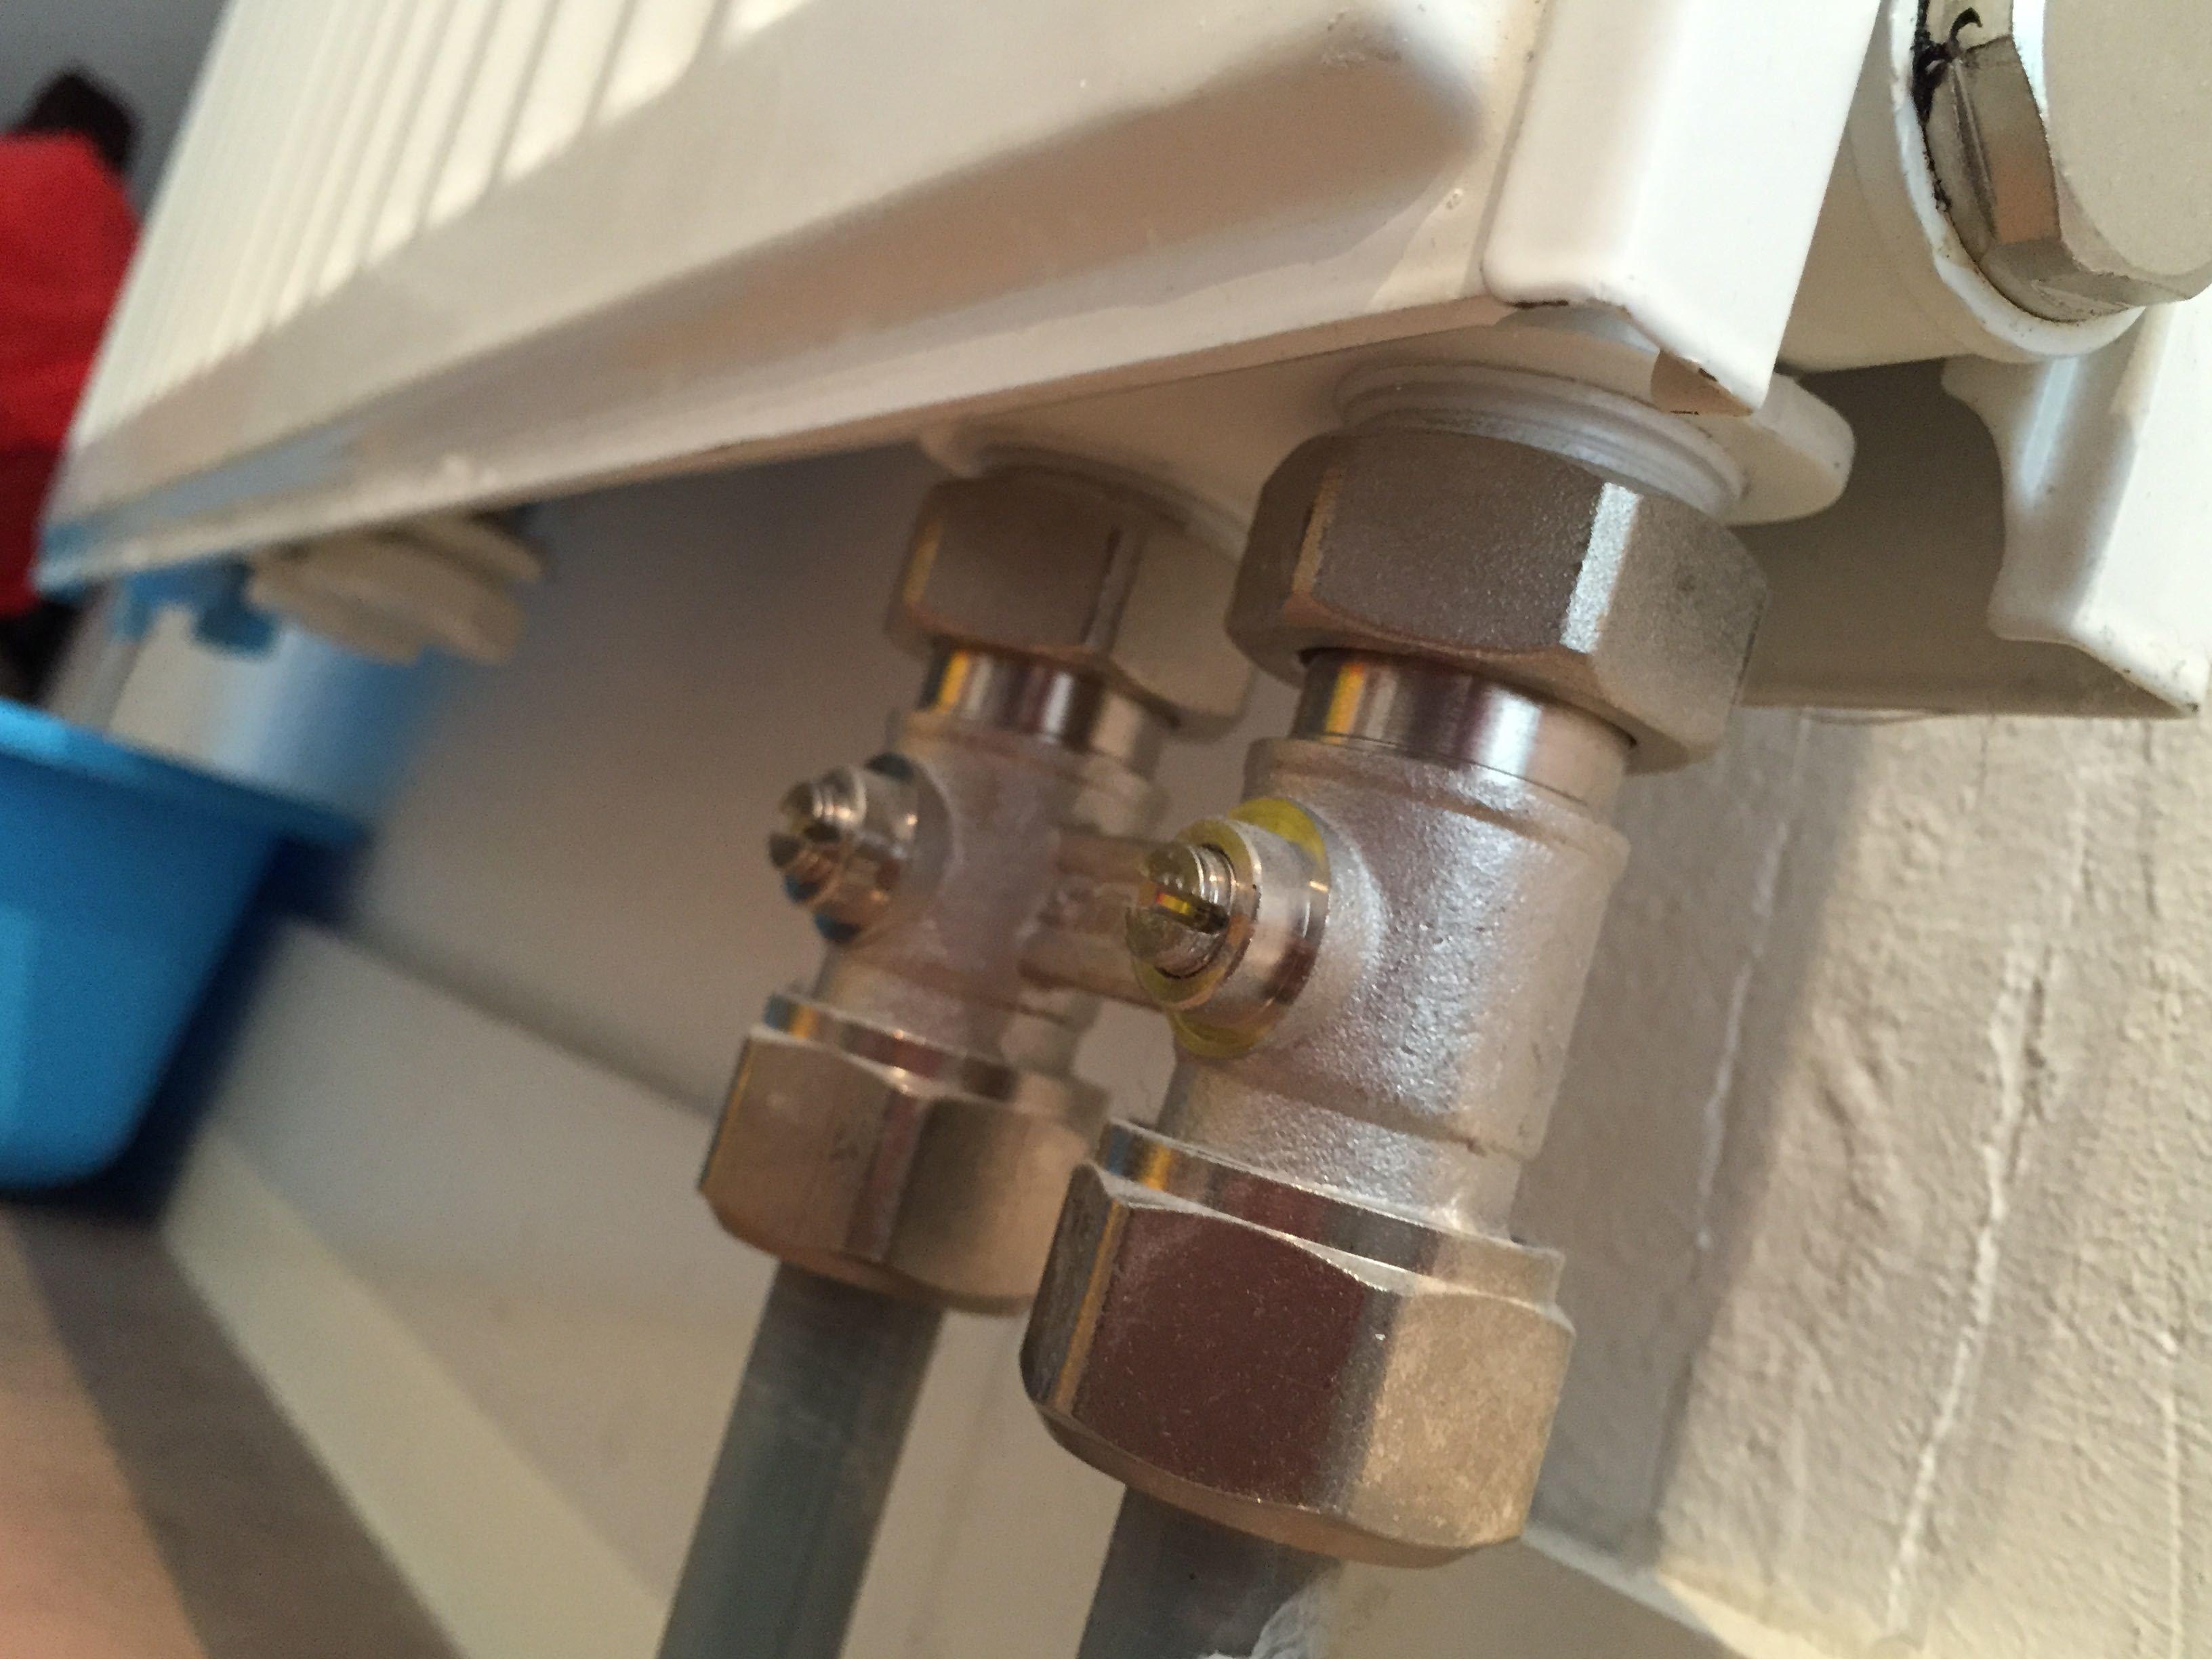 Radiator Slaapkamer Meubels : Fond radiatoren te koop in lubbeek binkom dehands be